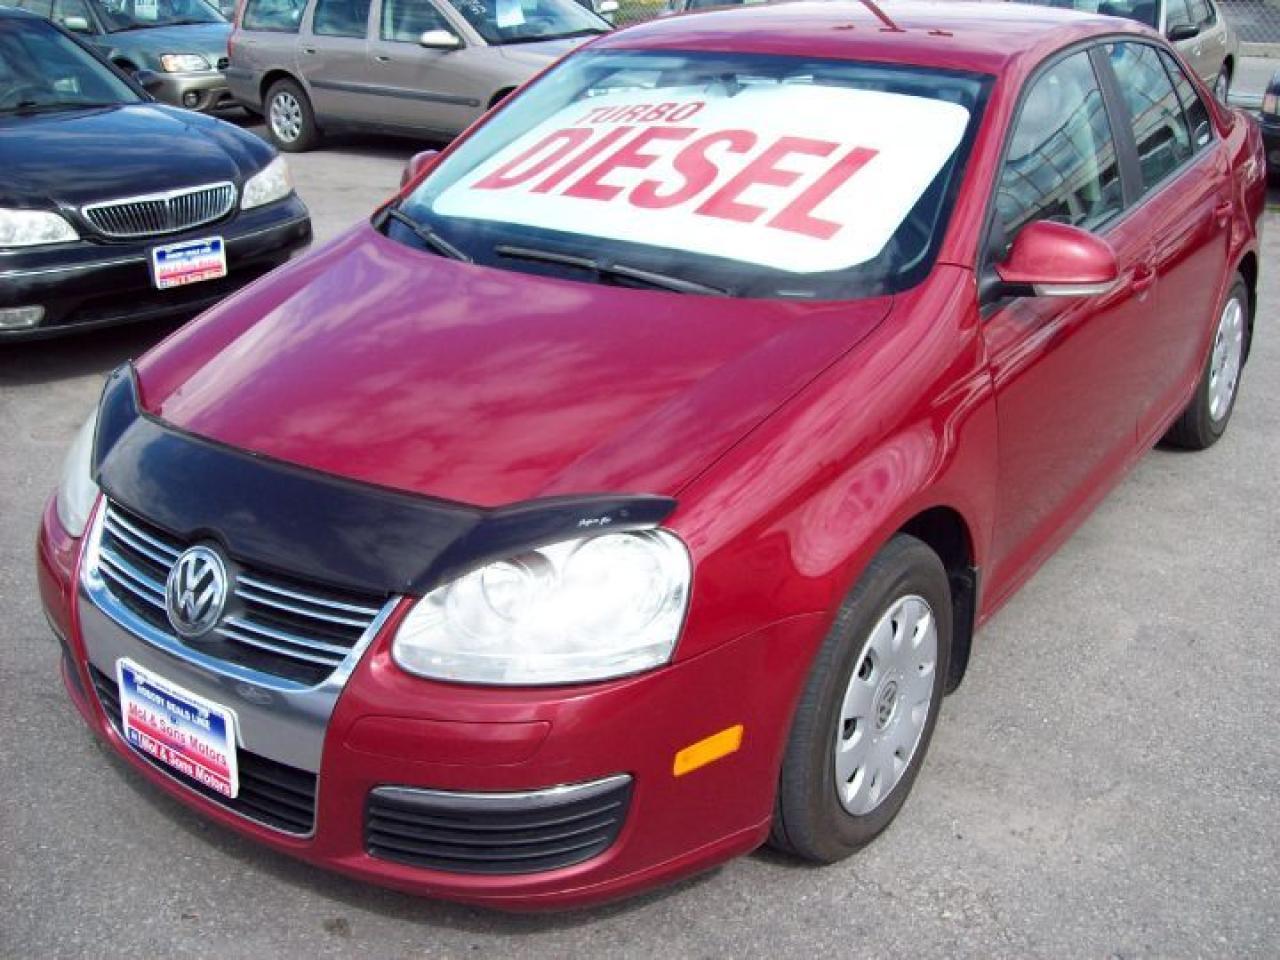 Photo of Red 2006 Volkswagen Jetta